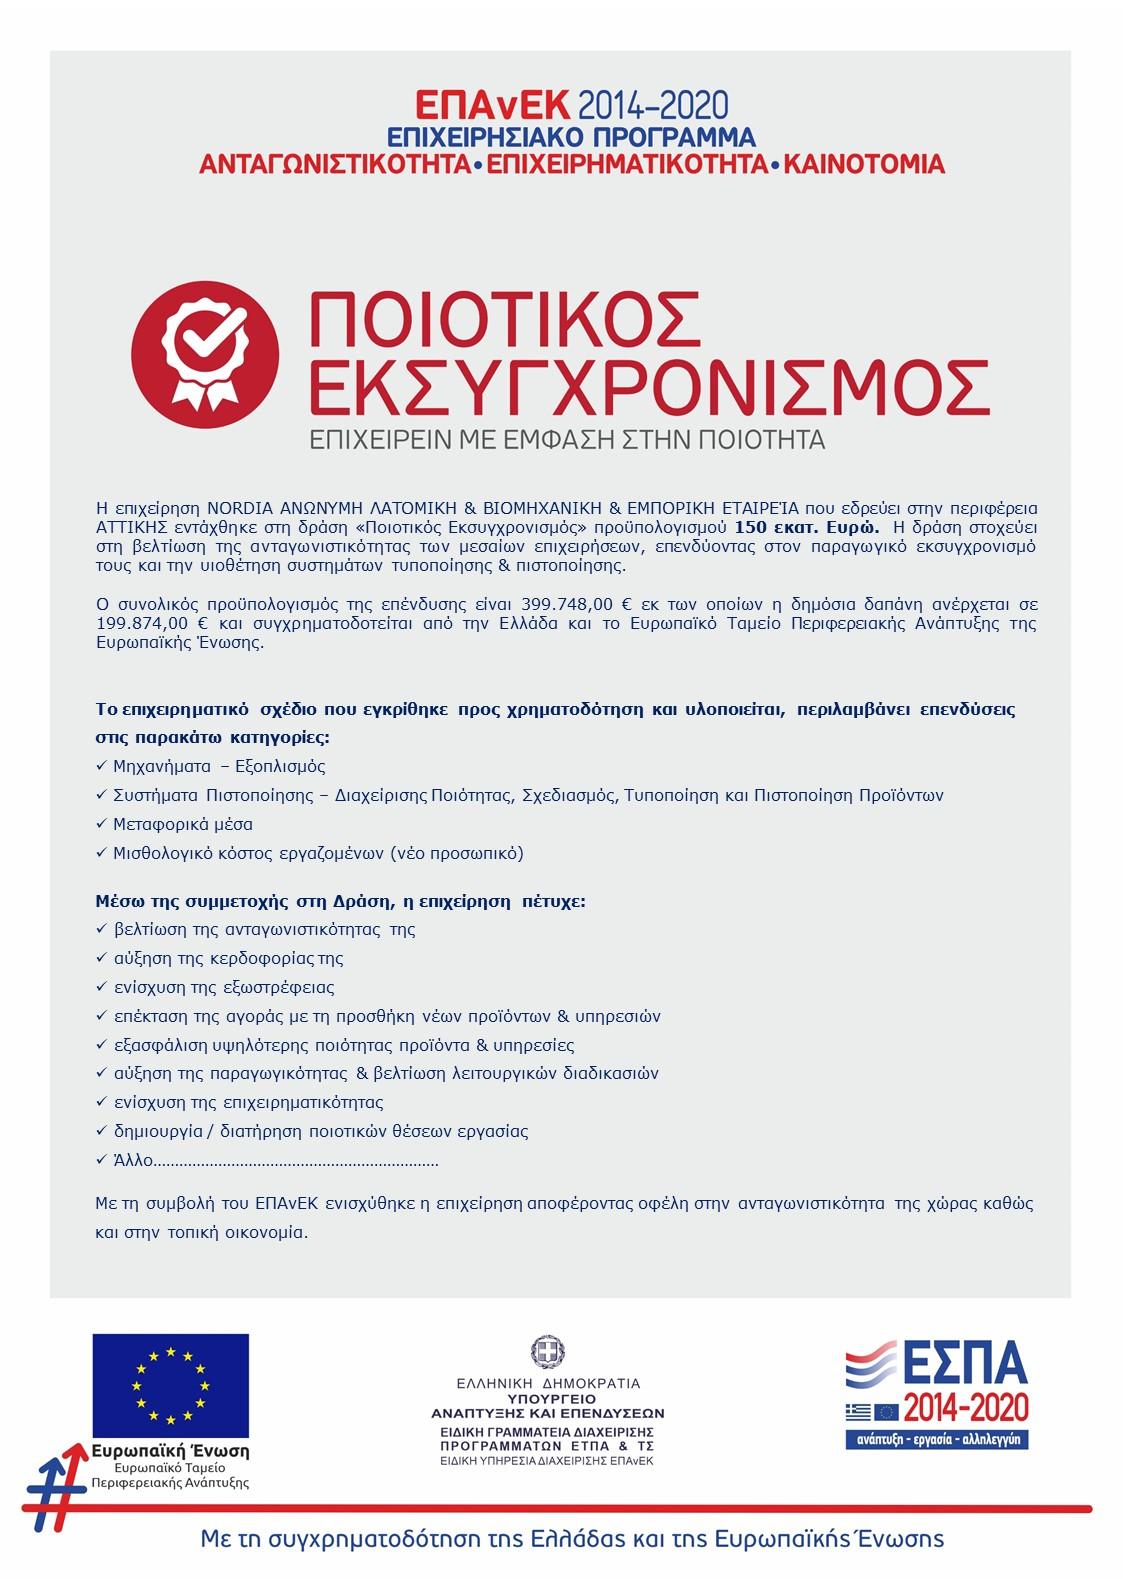 epanek 2014 2020 ποιοτικός εκσυγχρονισμός NORDIA MARBLE